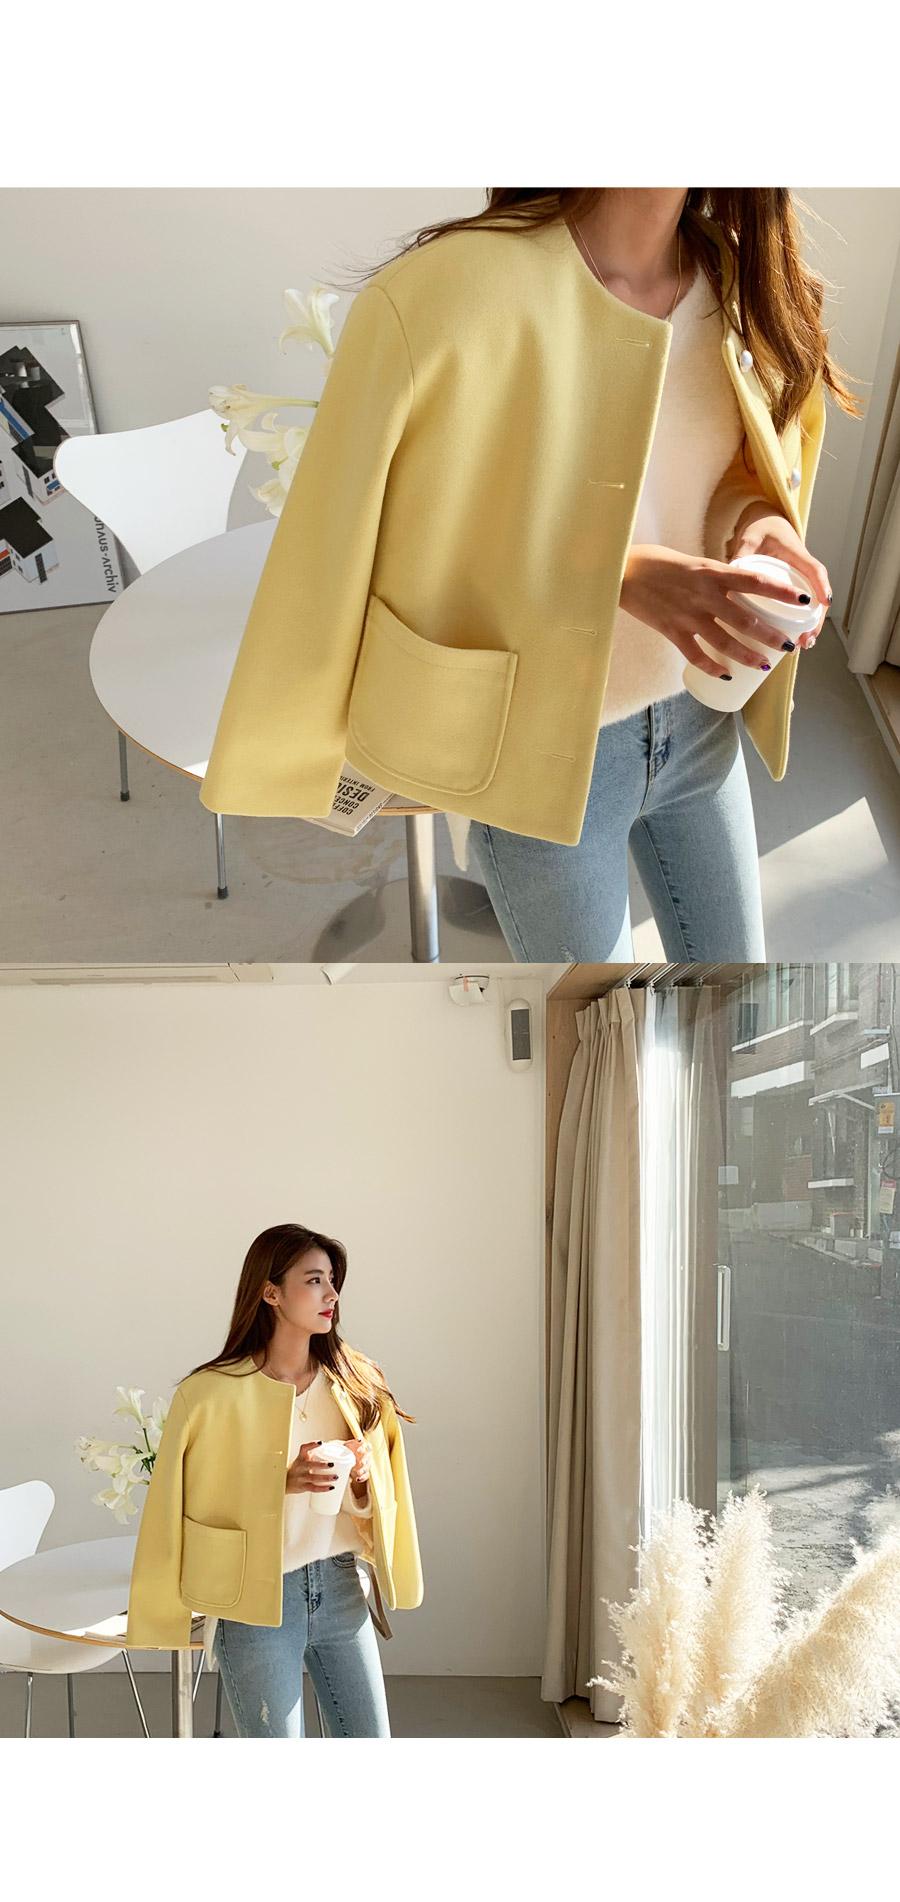 Fadeper Soft V Neck Knit